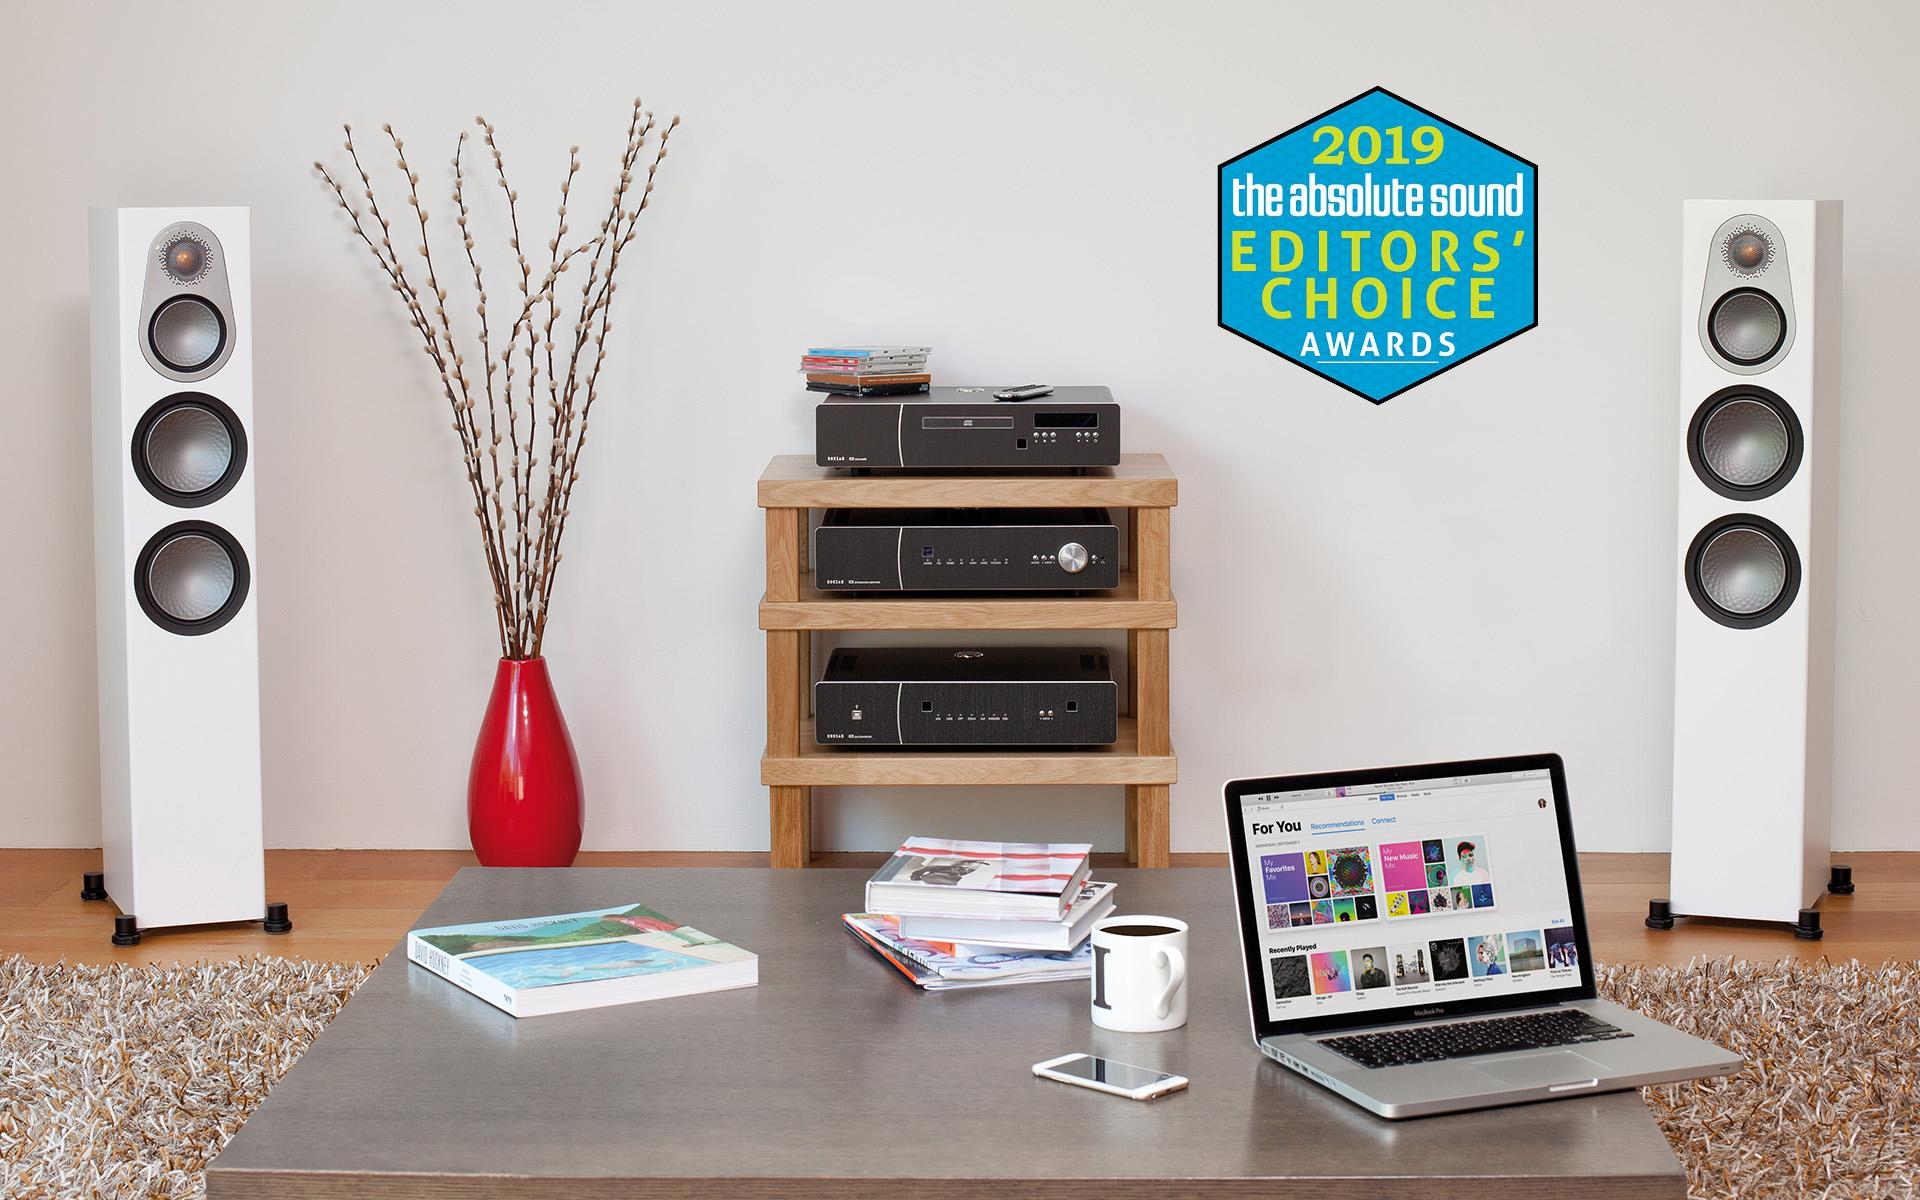 Модели Monitor Audio и ELAC – среди лучших колонок по версии журнала «The Absolute Sound»